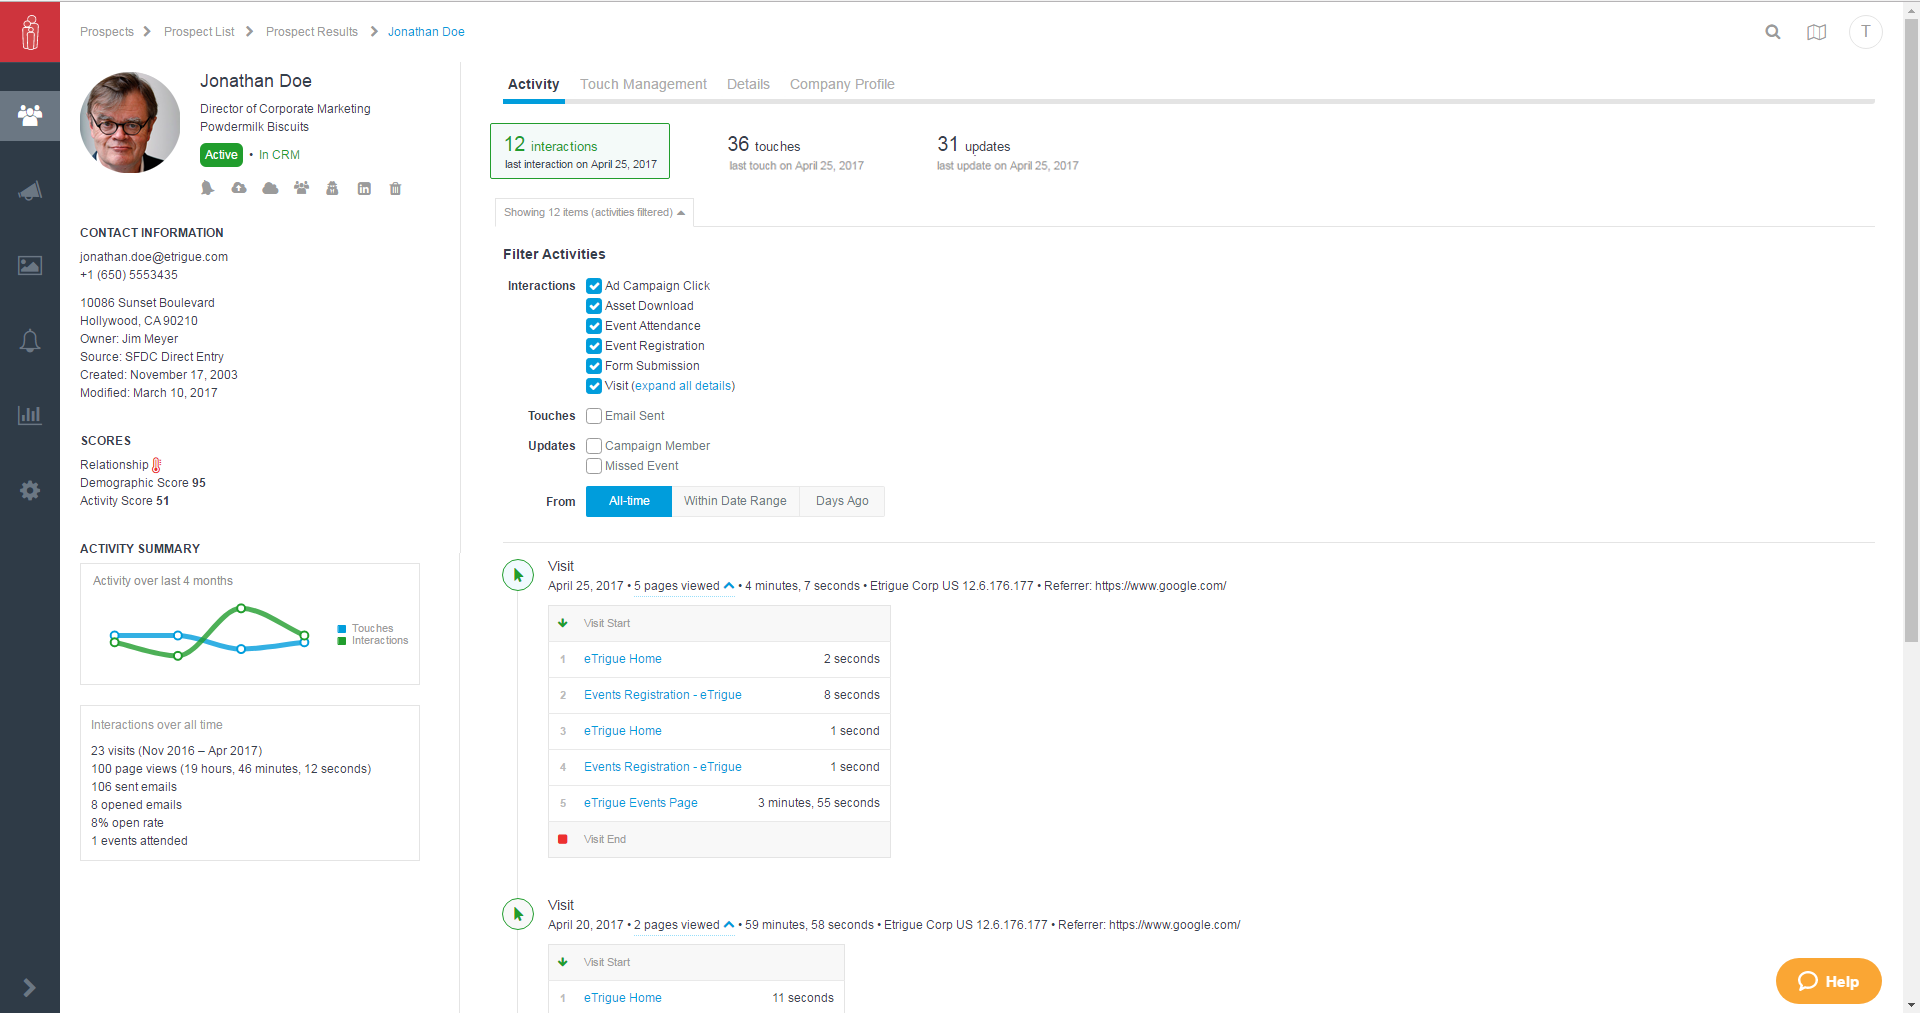 eTrigue Demo - Complete Prospect Profile